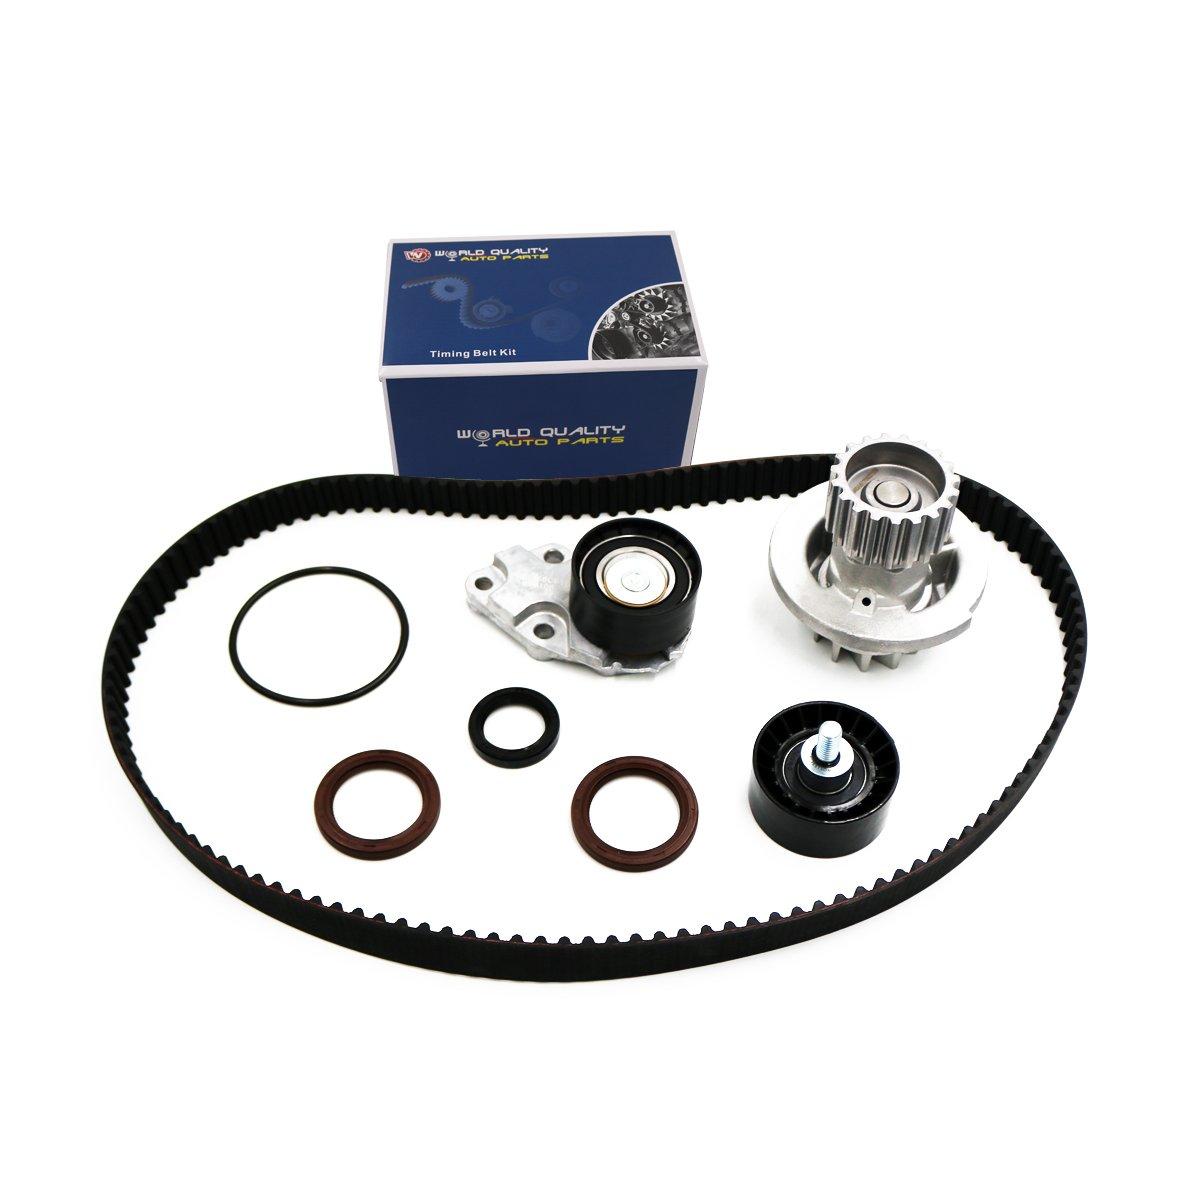 Timing Belt Kit Water Pump w/Gaskets Tensioner for 2004 2005 2006 2007 2008 Chevrolet Aveo 1.6L DOHC L4 16V WQ TS26335 CTBK-C013WP-1